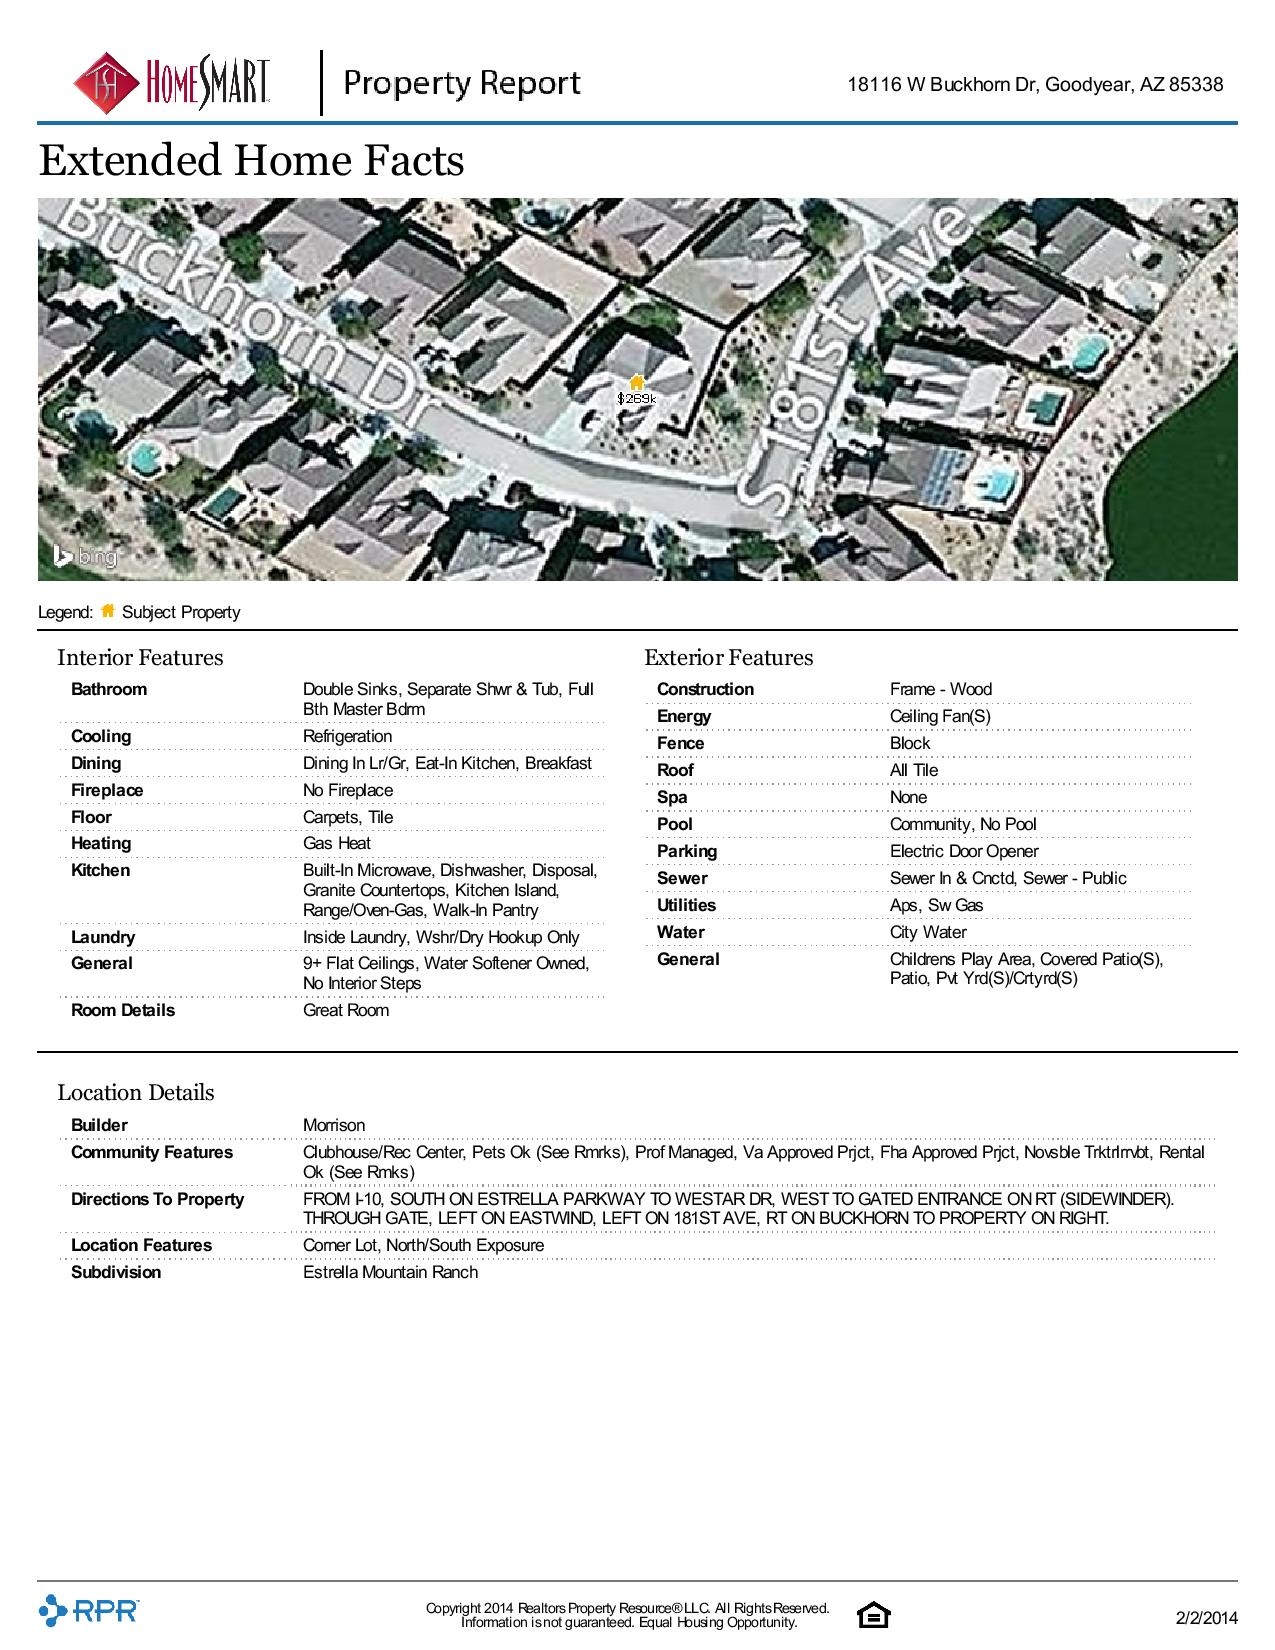 18116-W-Buckhorn-Dr-Goodyear-AZ-85338.pdf-page-004